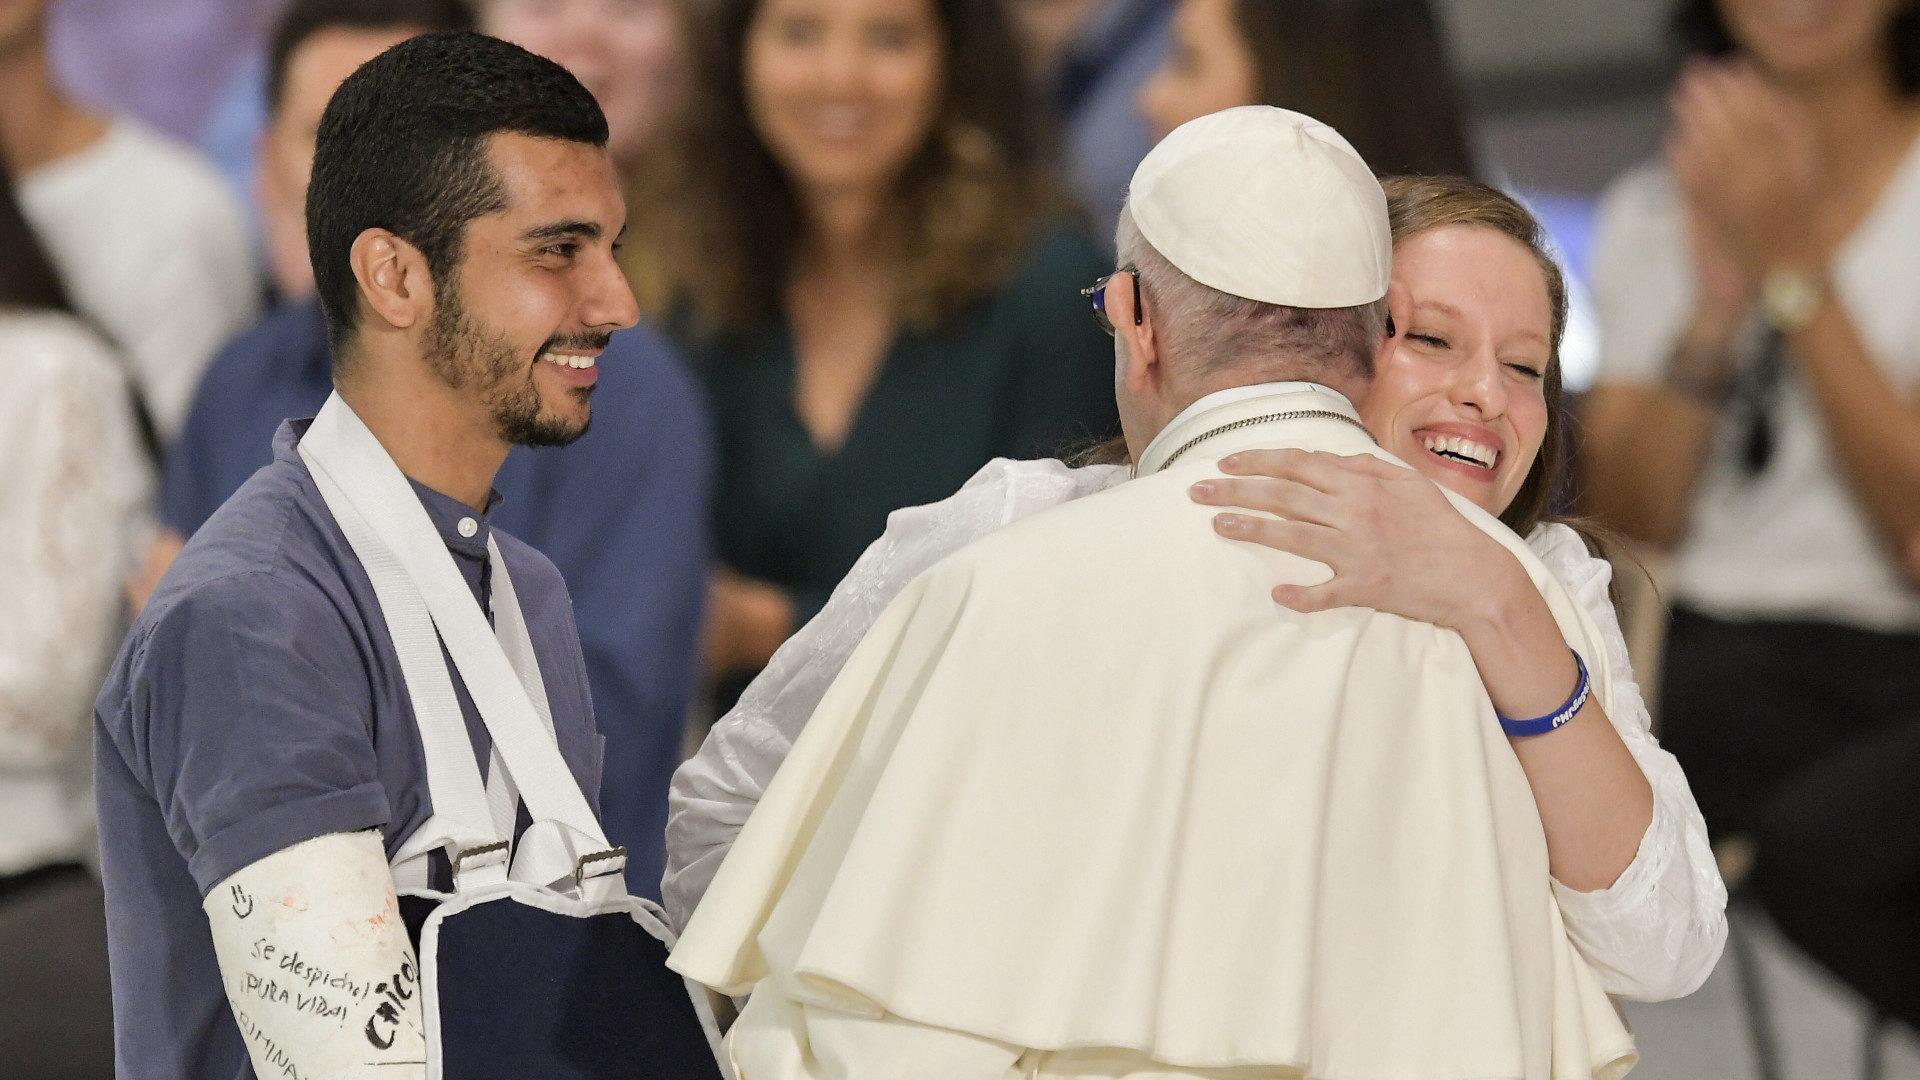 Papst Franziskus umarmt Jugendliche während des Festes der Begegnung an der Jugendsynode. | © KNA